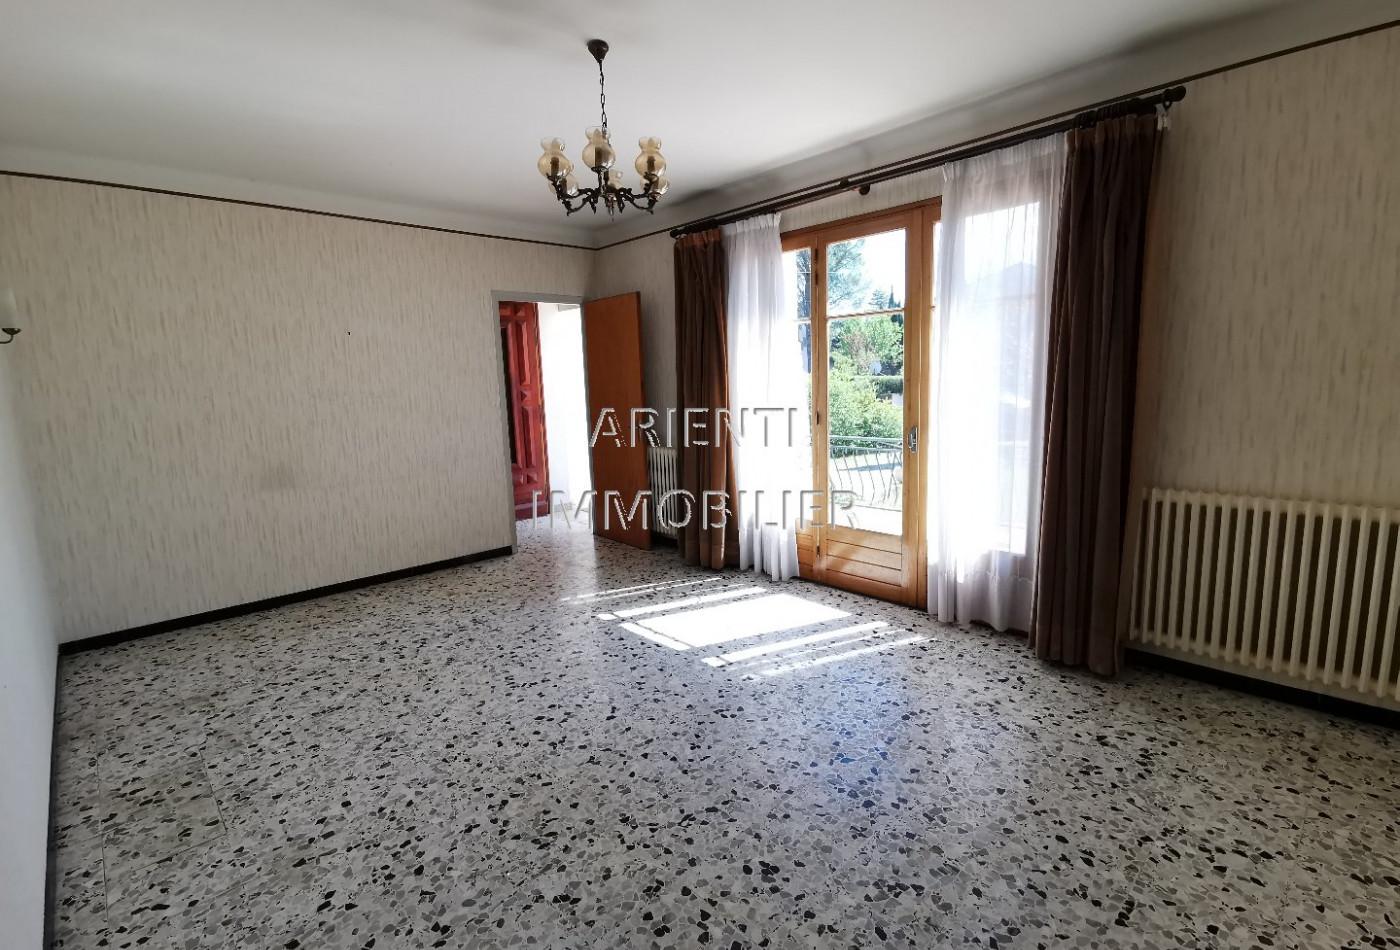 A vendre  Valreas | Réf 260013486 - Office immobilier arienti